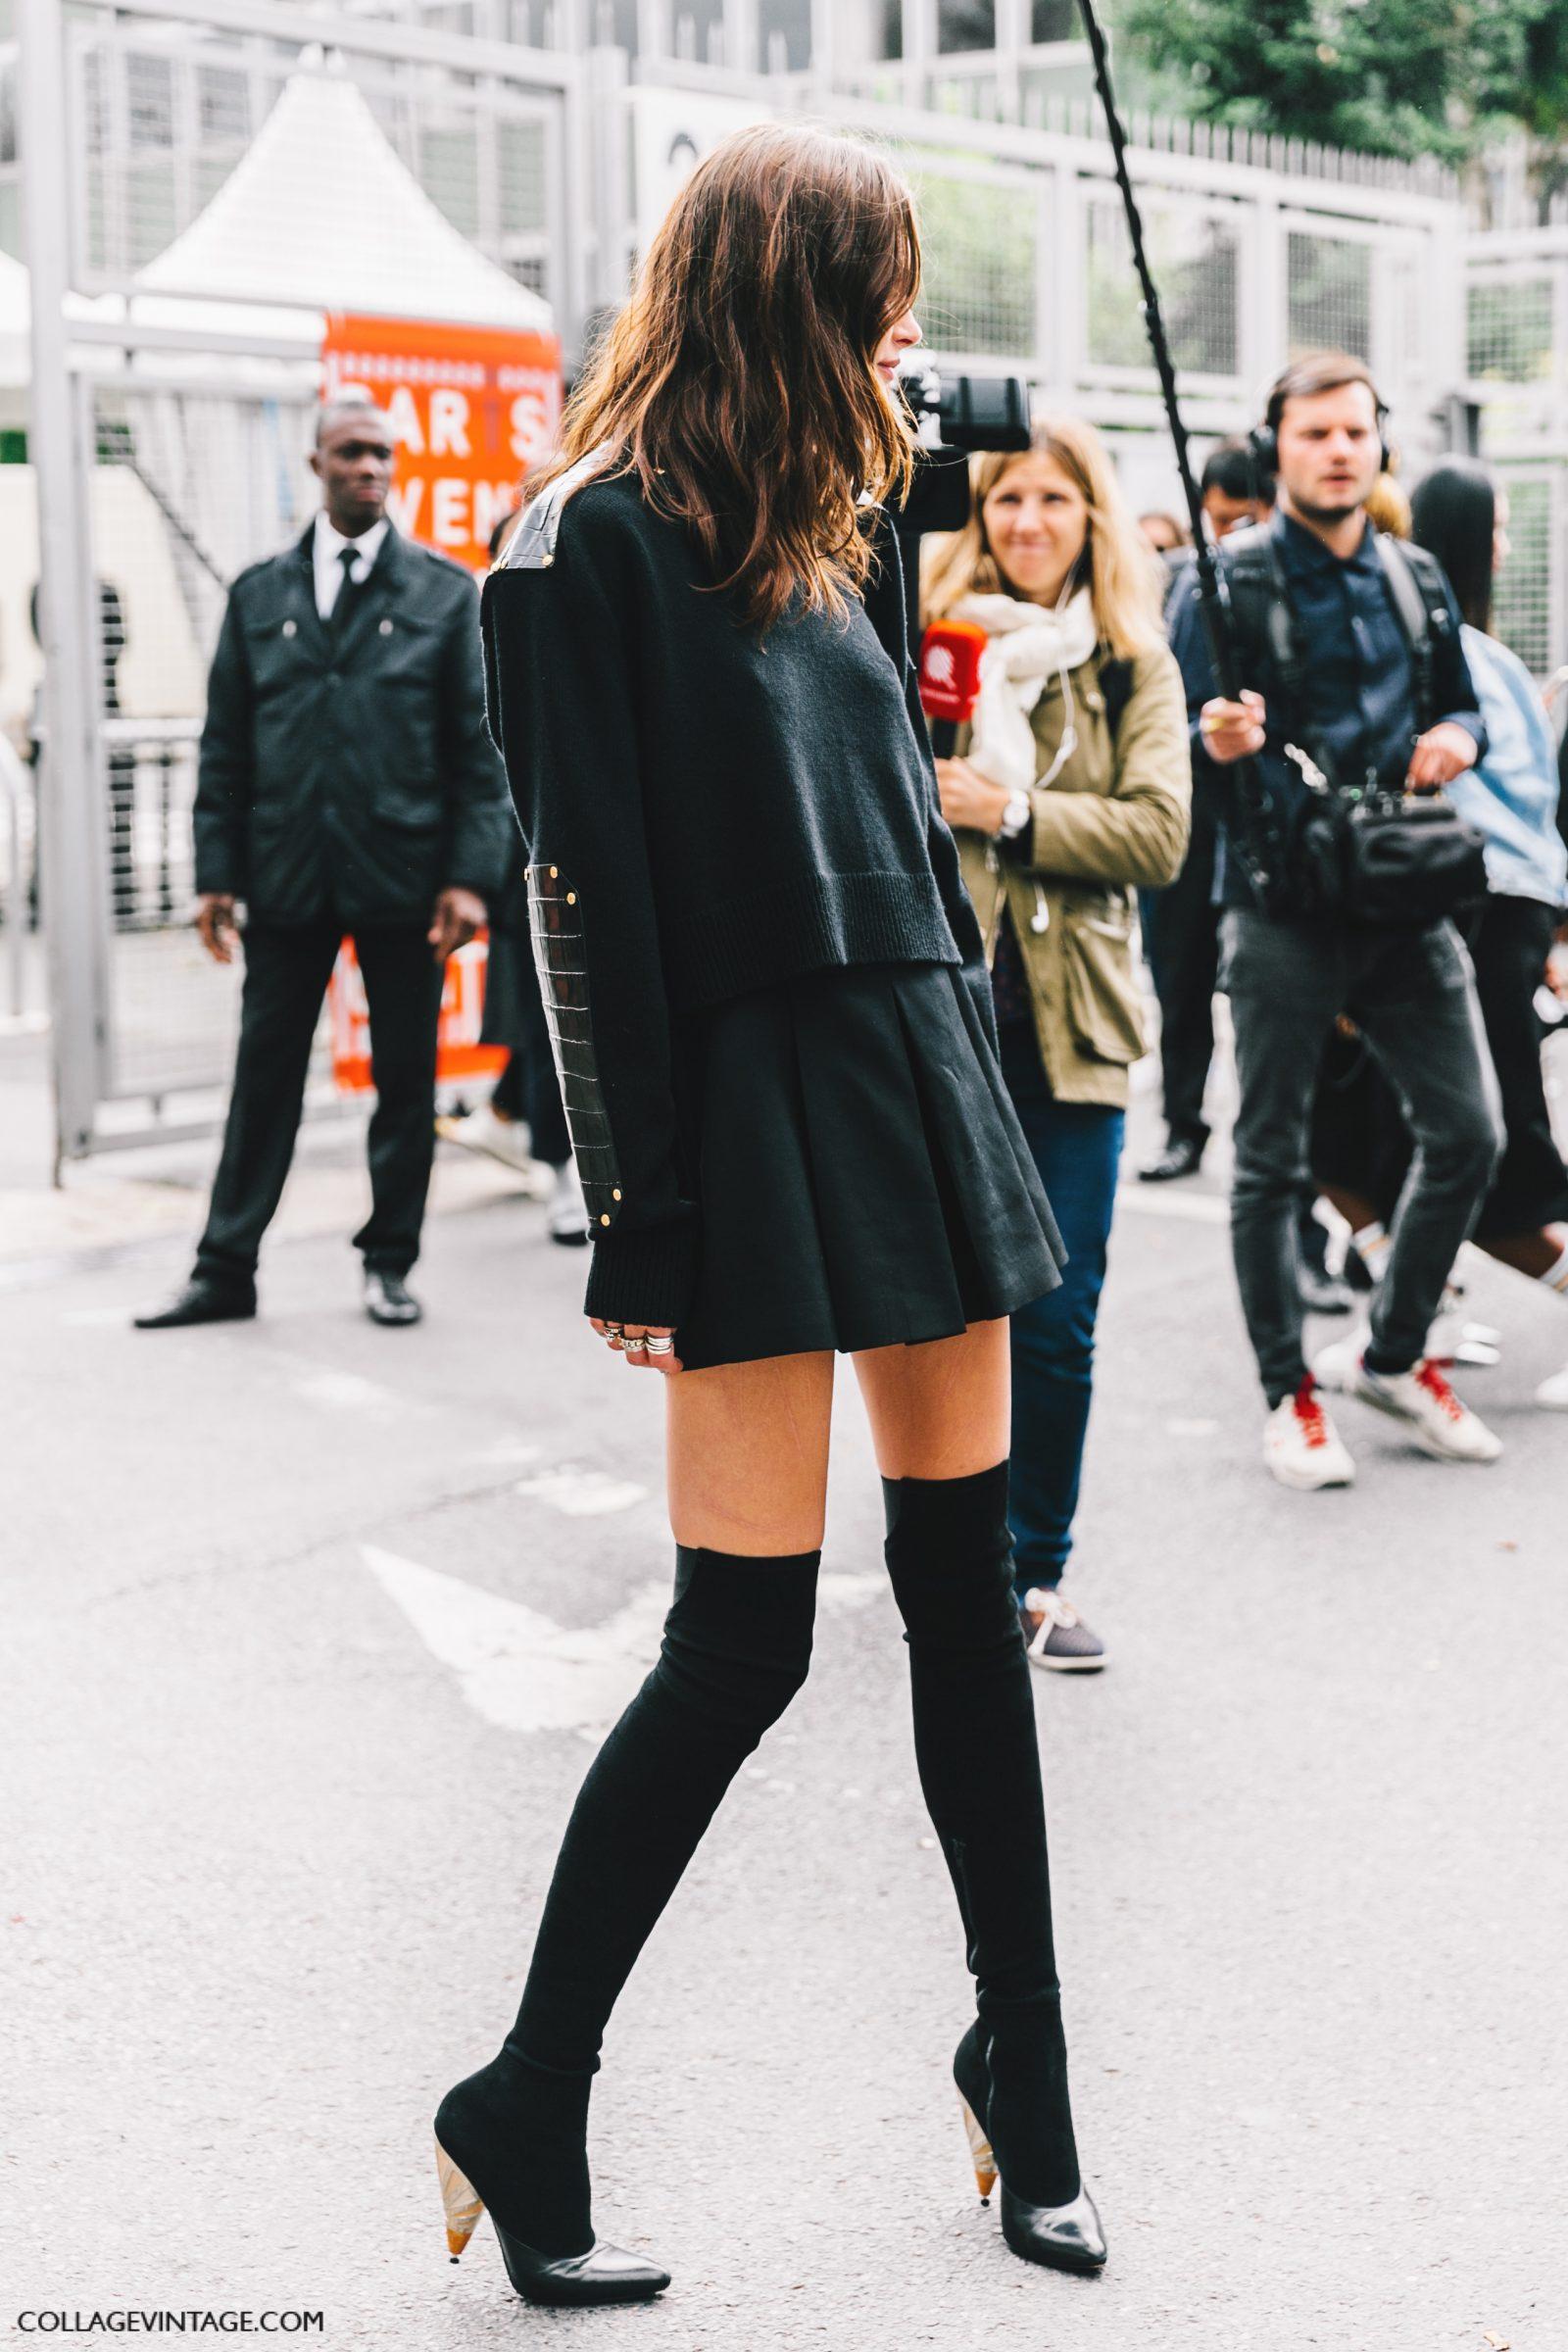 pfw-paris_fashion_week_ss17-street_style-outfits-collage_vintage-valentino-balenciaga-celine-43